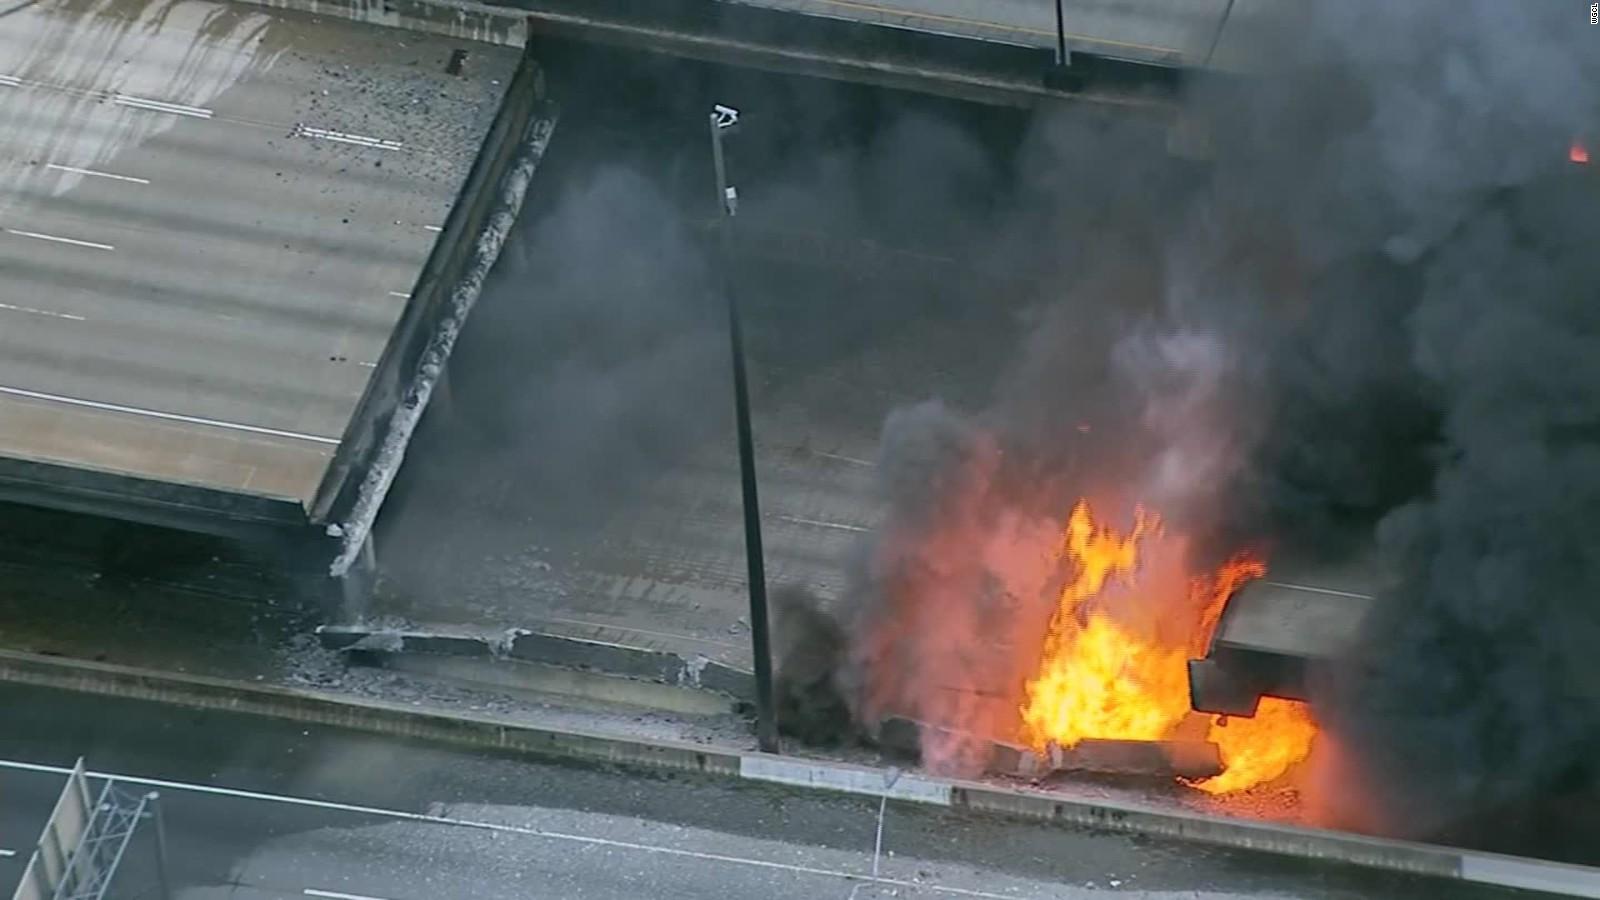 fire caught on cctv camera